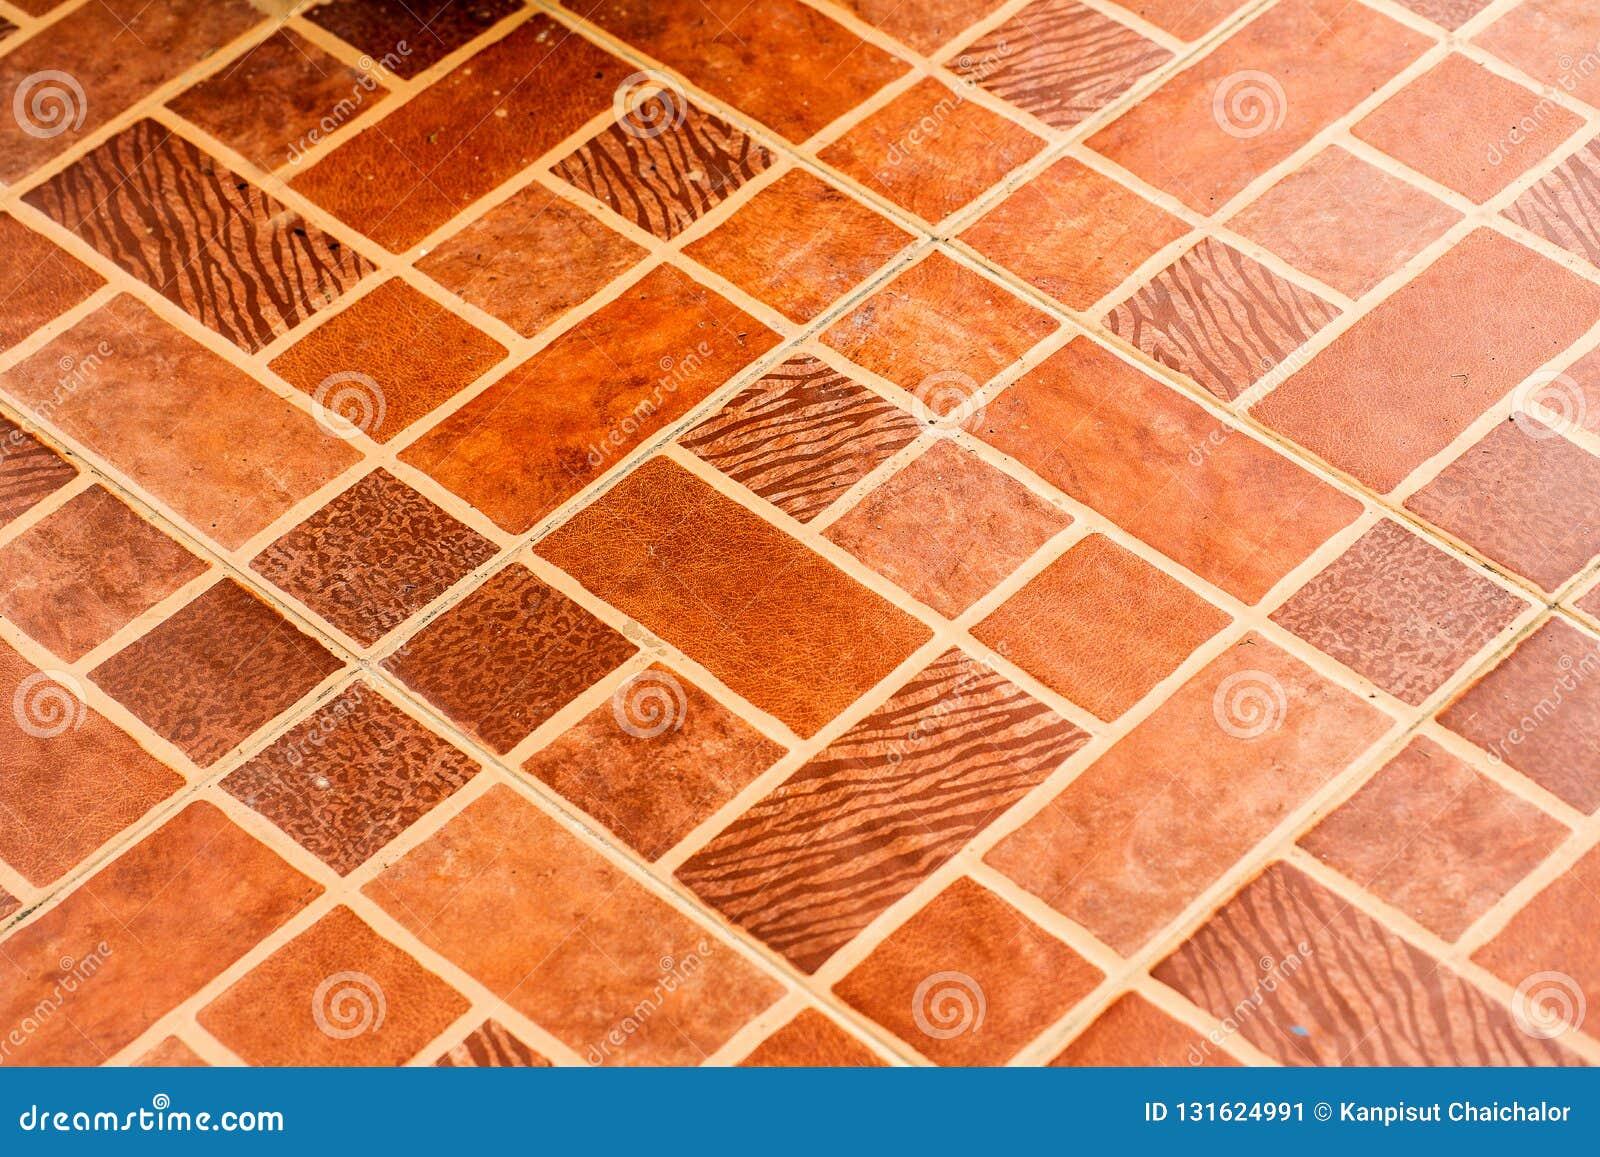 Orange Tiles Floor Background Orange Tile Architecture